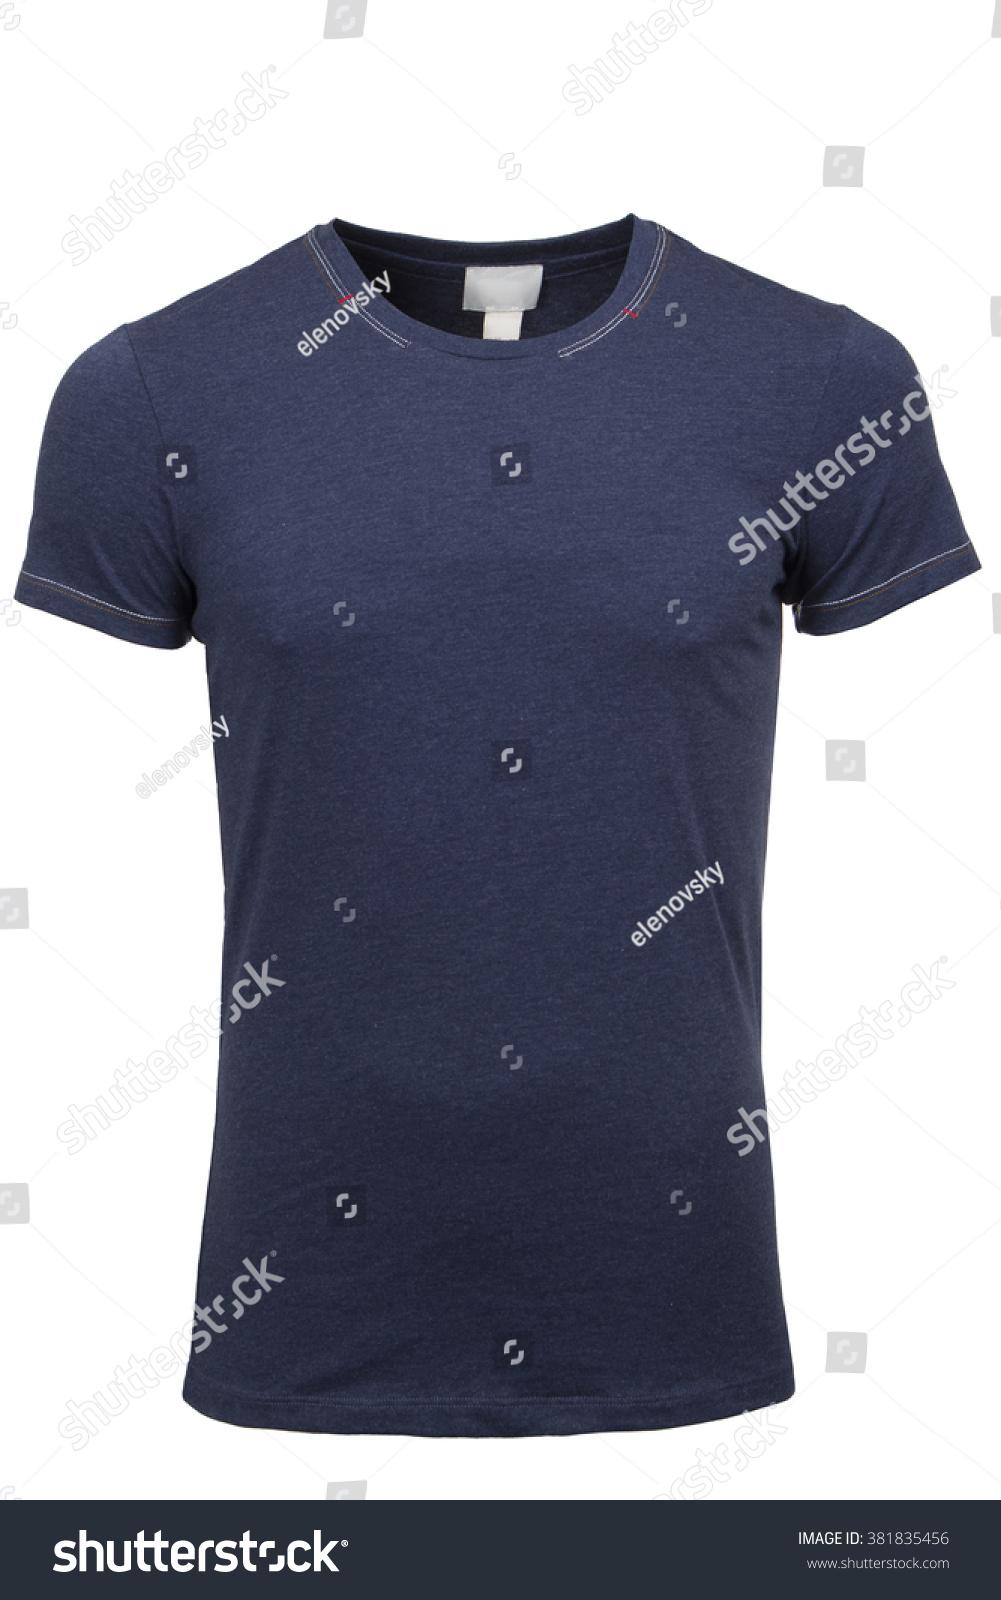 Royalty Free Dark Blue Tshirt Template 381835456 Stock Photo